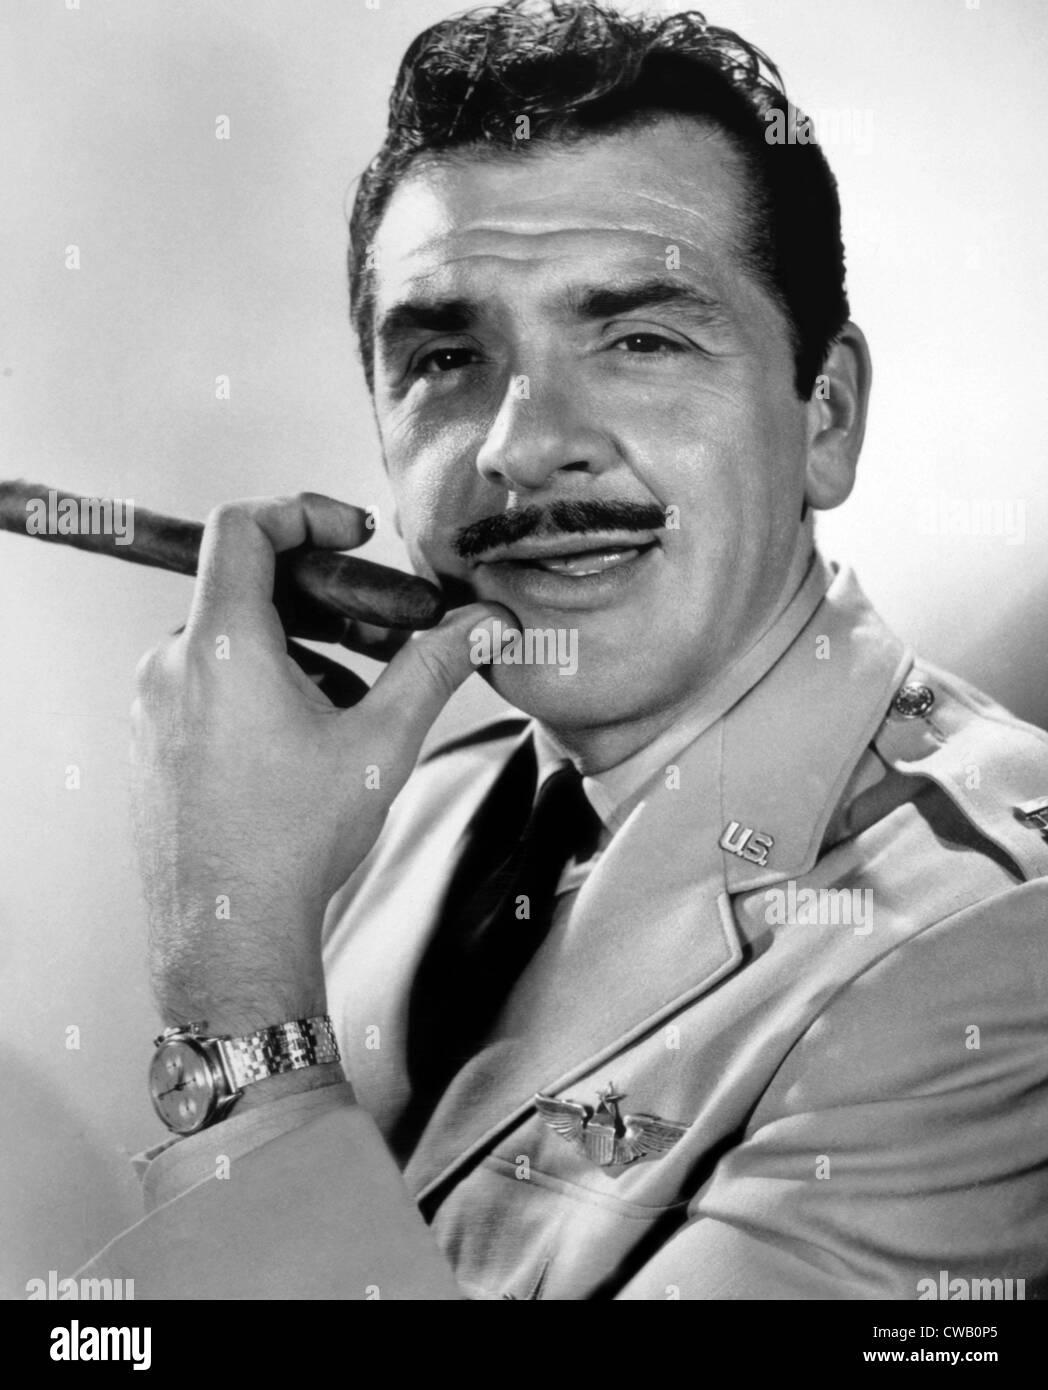 WAKE ME WHEN IT'S OVER, Ernie Kovacs, 1960, TM & Copyright (c) 20th Century Fox Film Corp./courtesy Everett - Stock Image